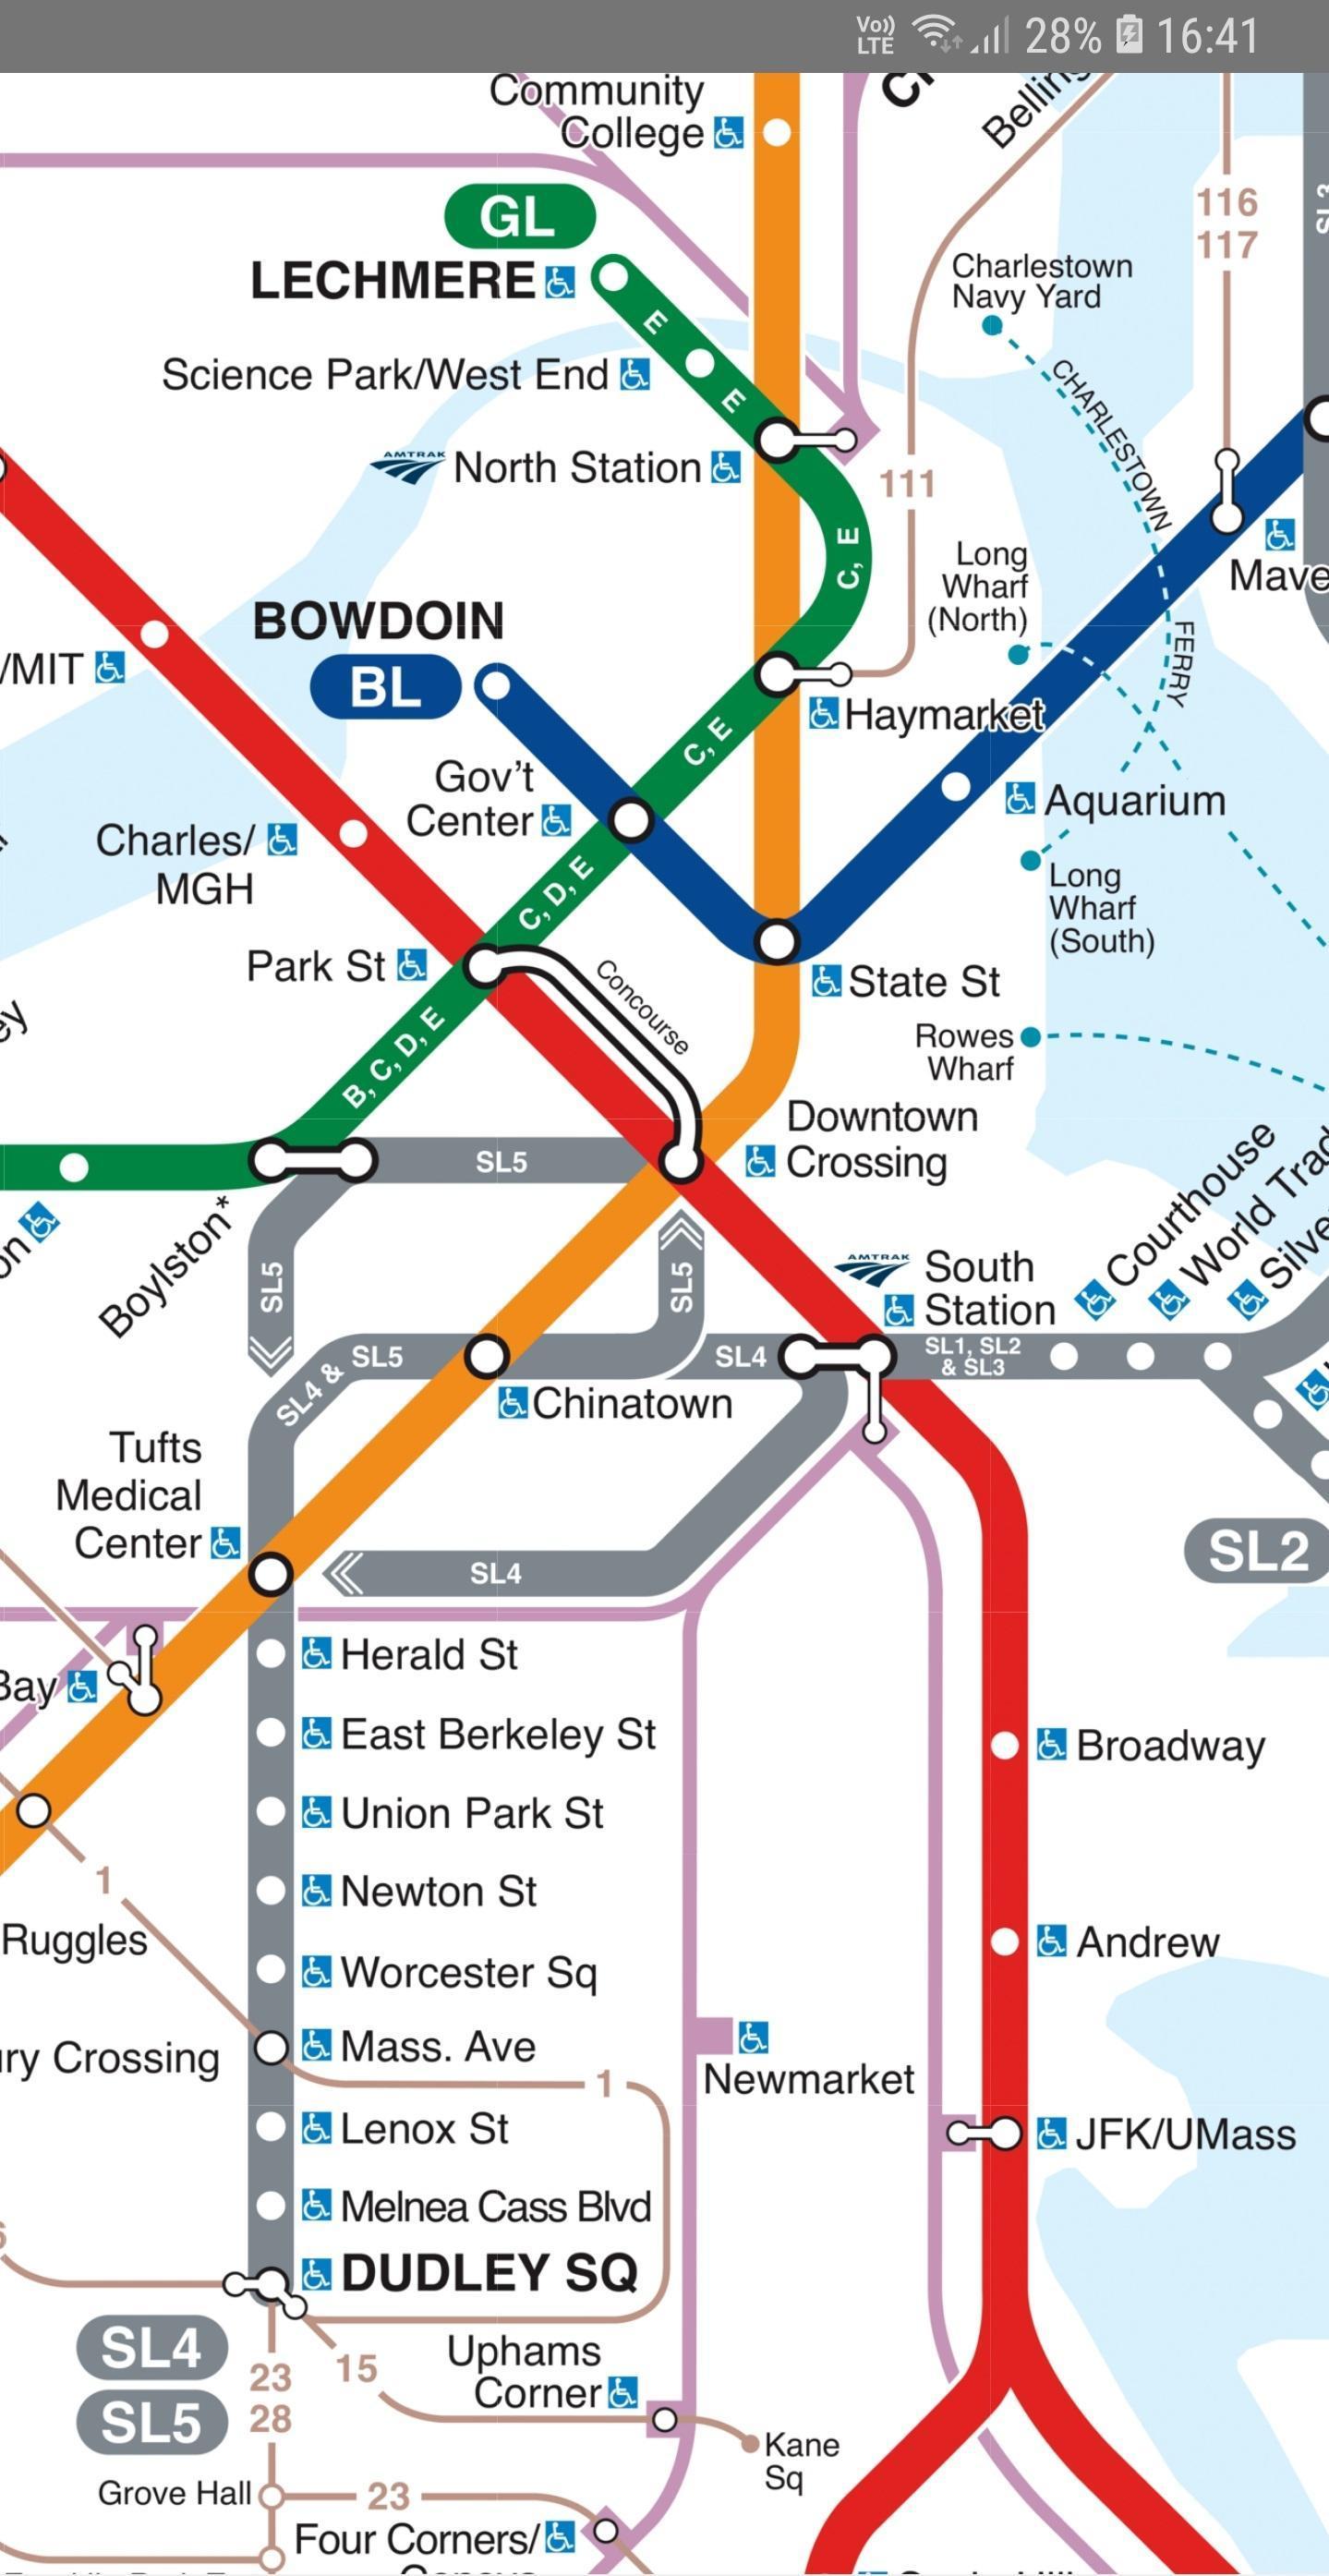 Mbta Subway Map Boston Ma.Boston Ma Metro Map Mbta For Android Apk Download